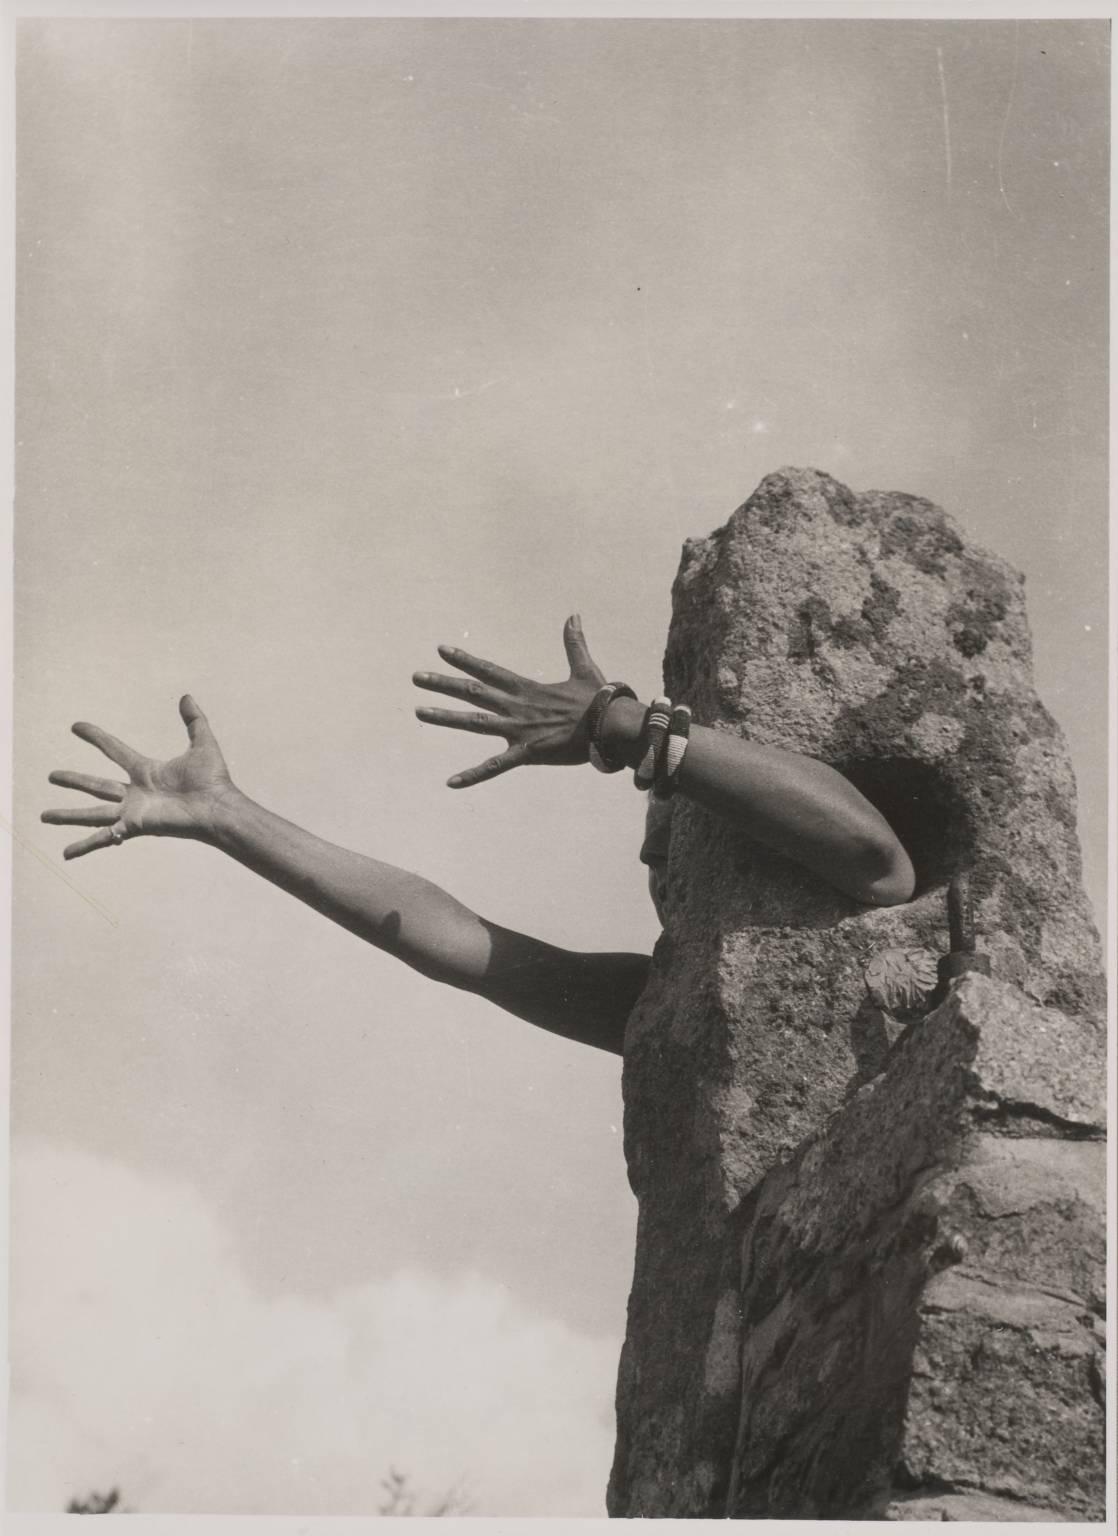 Claude Cahun, Je tends les bras, 1931-1932